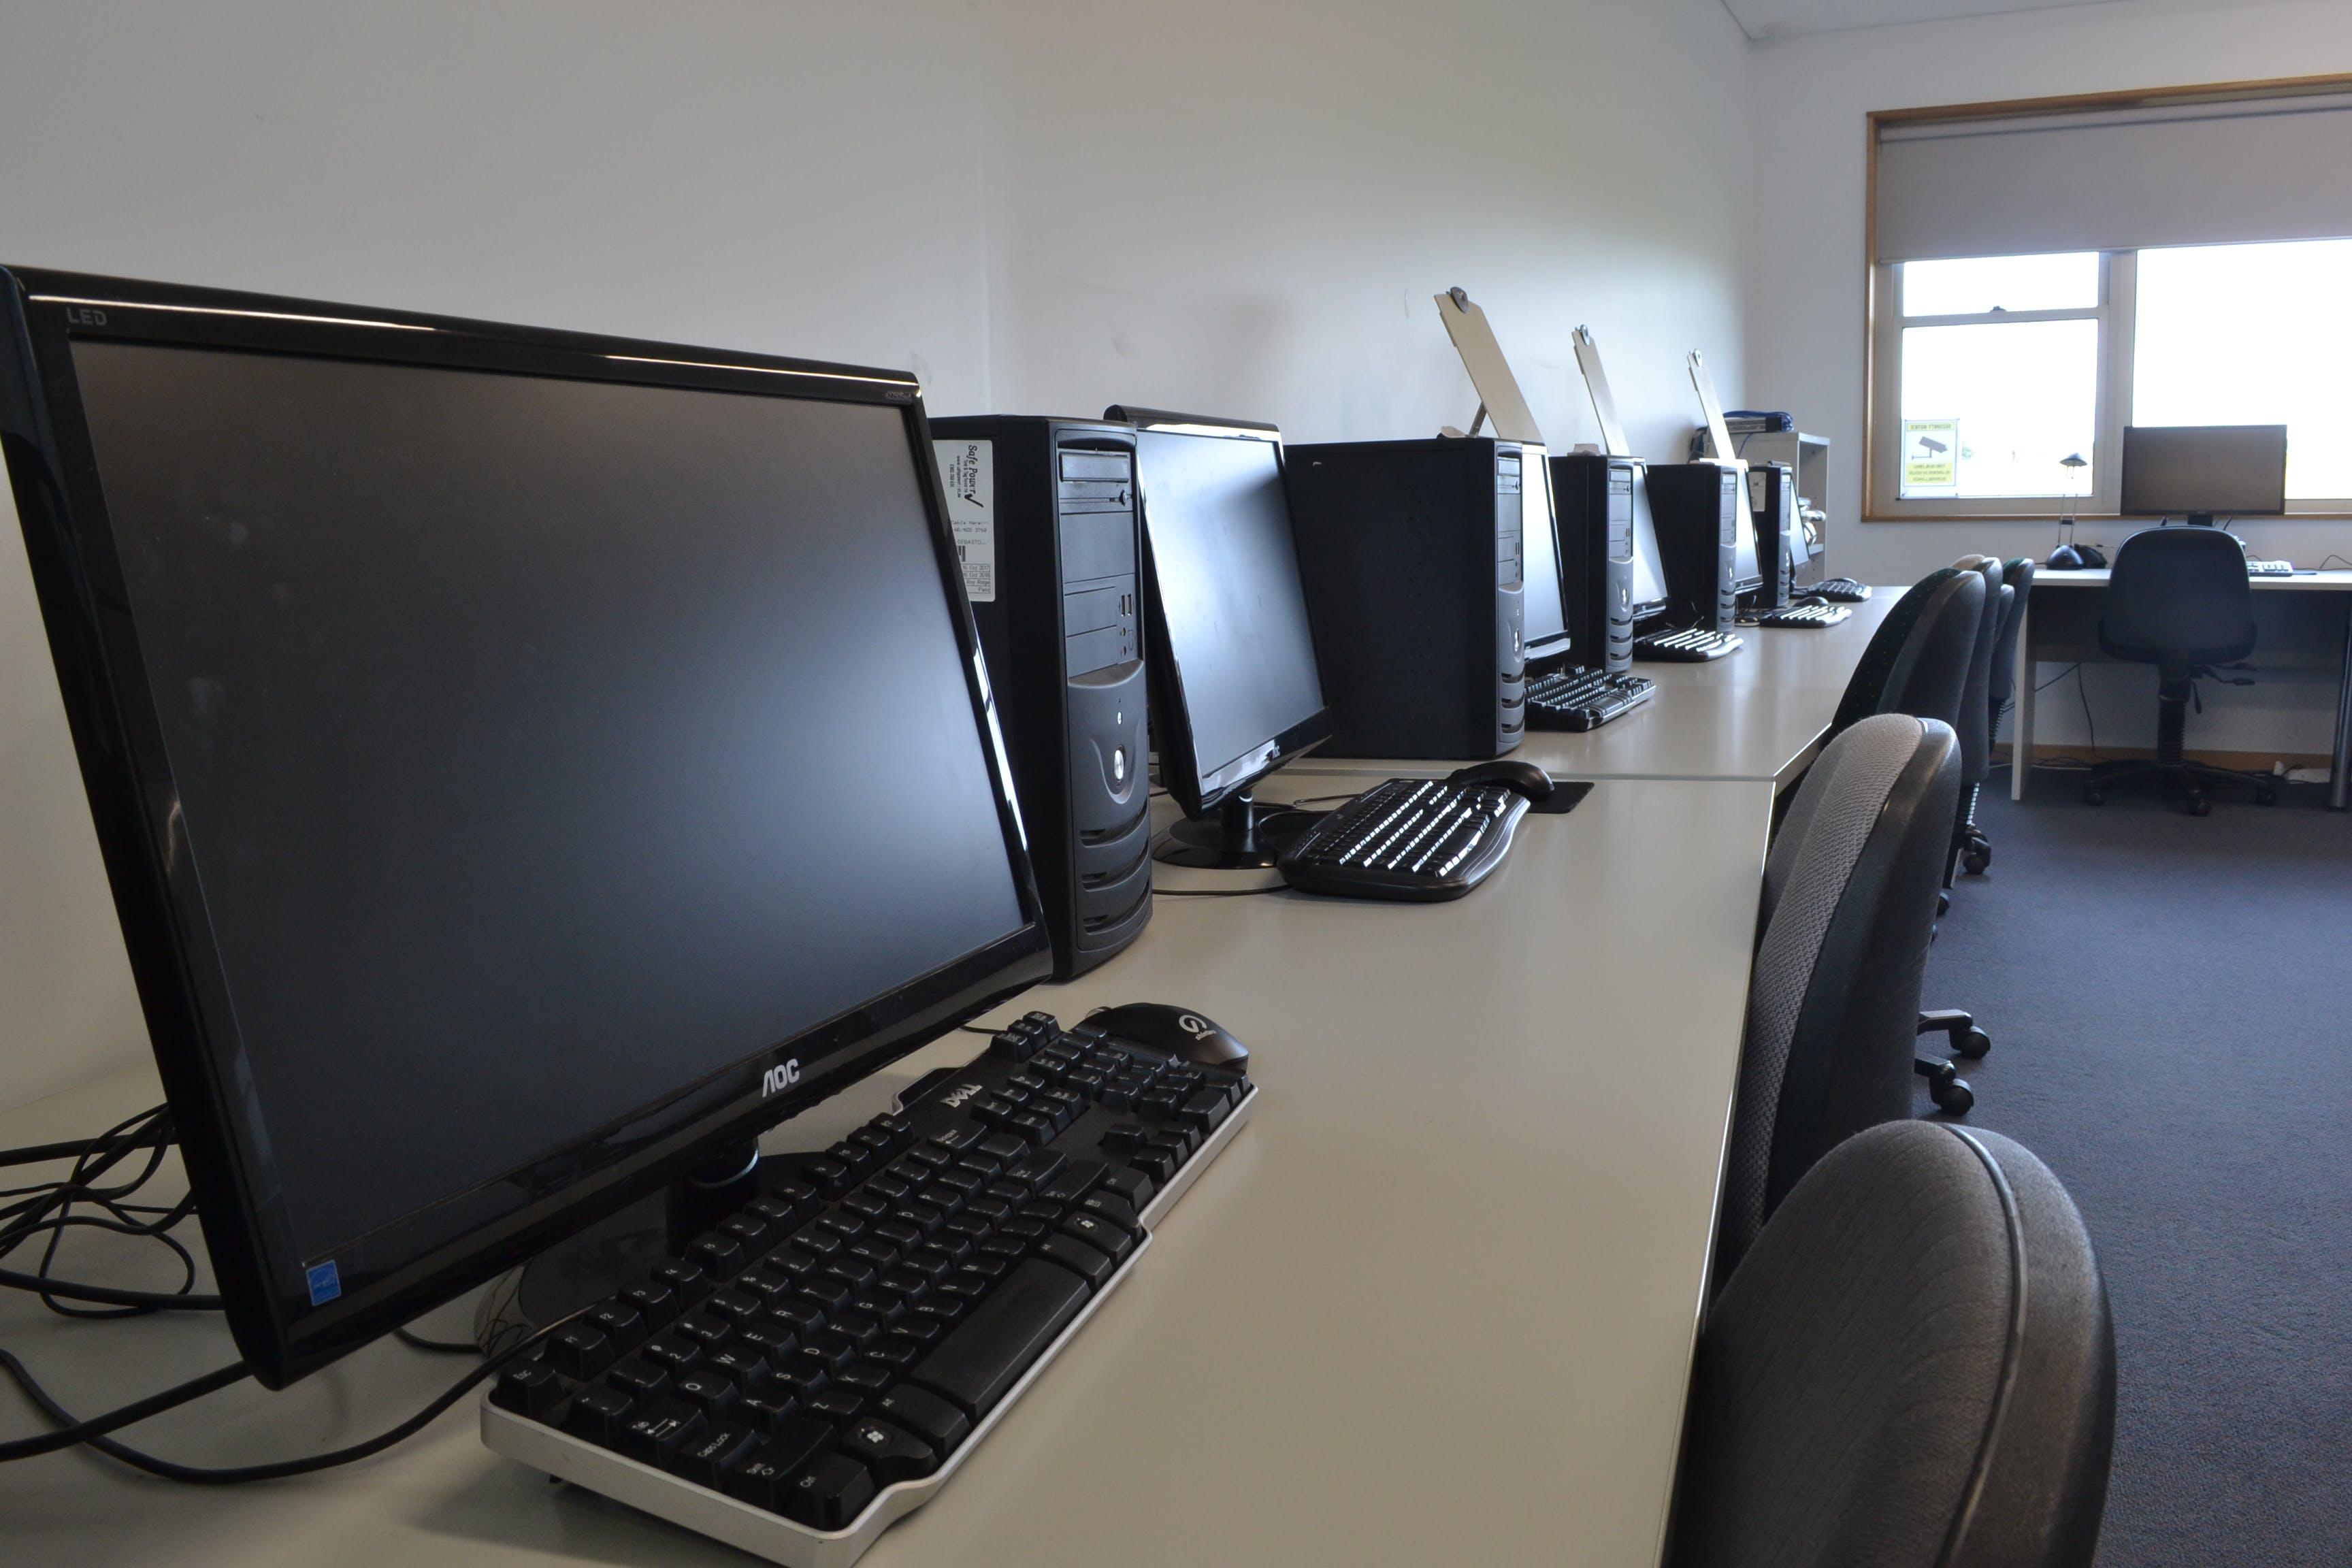 Computer Labs and Meeting Rooms, training room at Ballarat South Community Hub, image 1